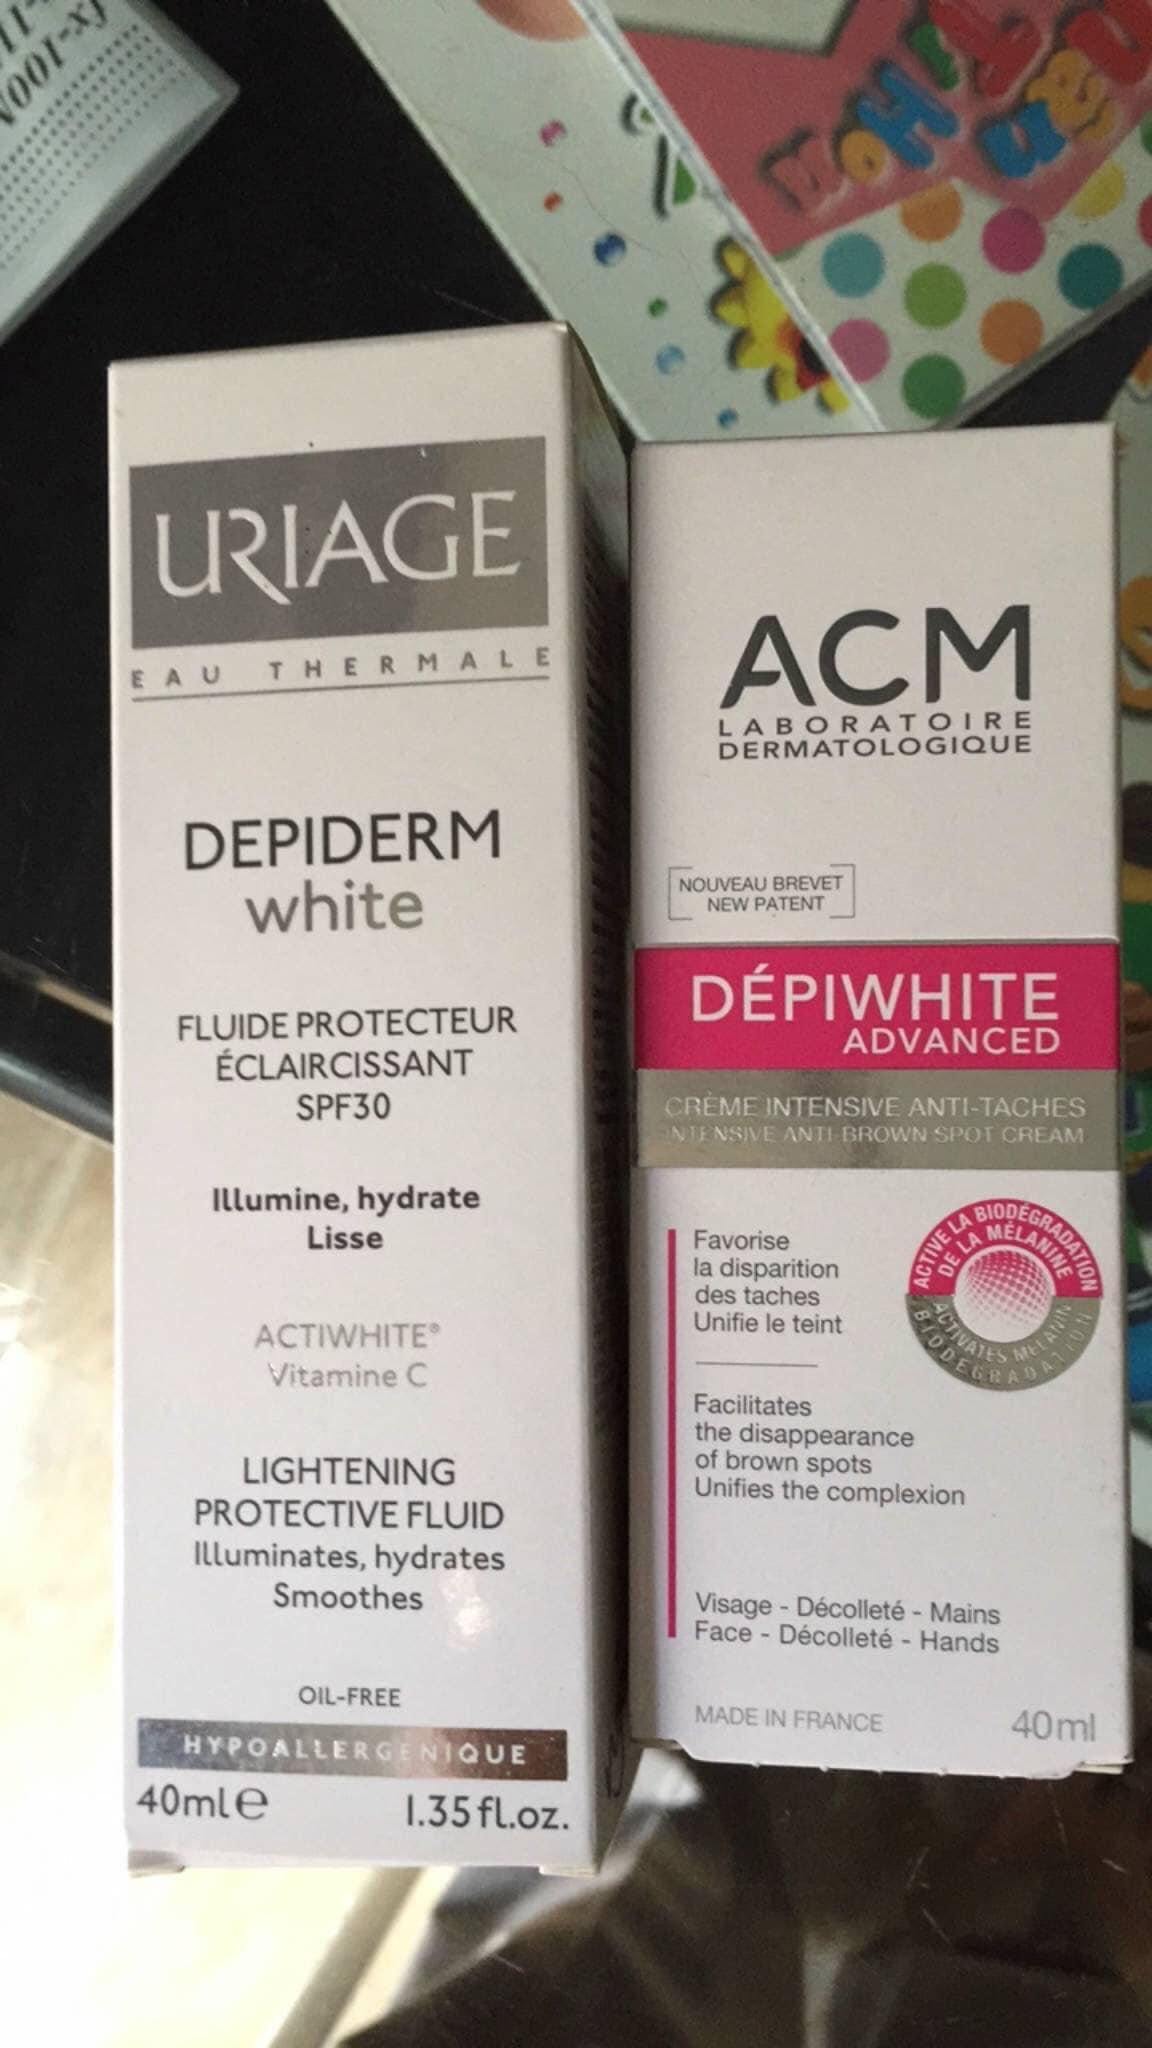 Sữa Dưỡng Sáng Da Uriage Depiderm White Lightening Protective Fluide Spf30 40Ml